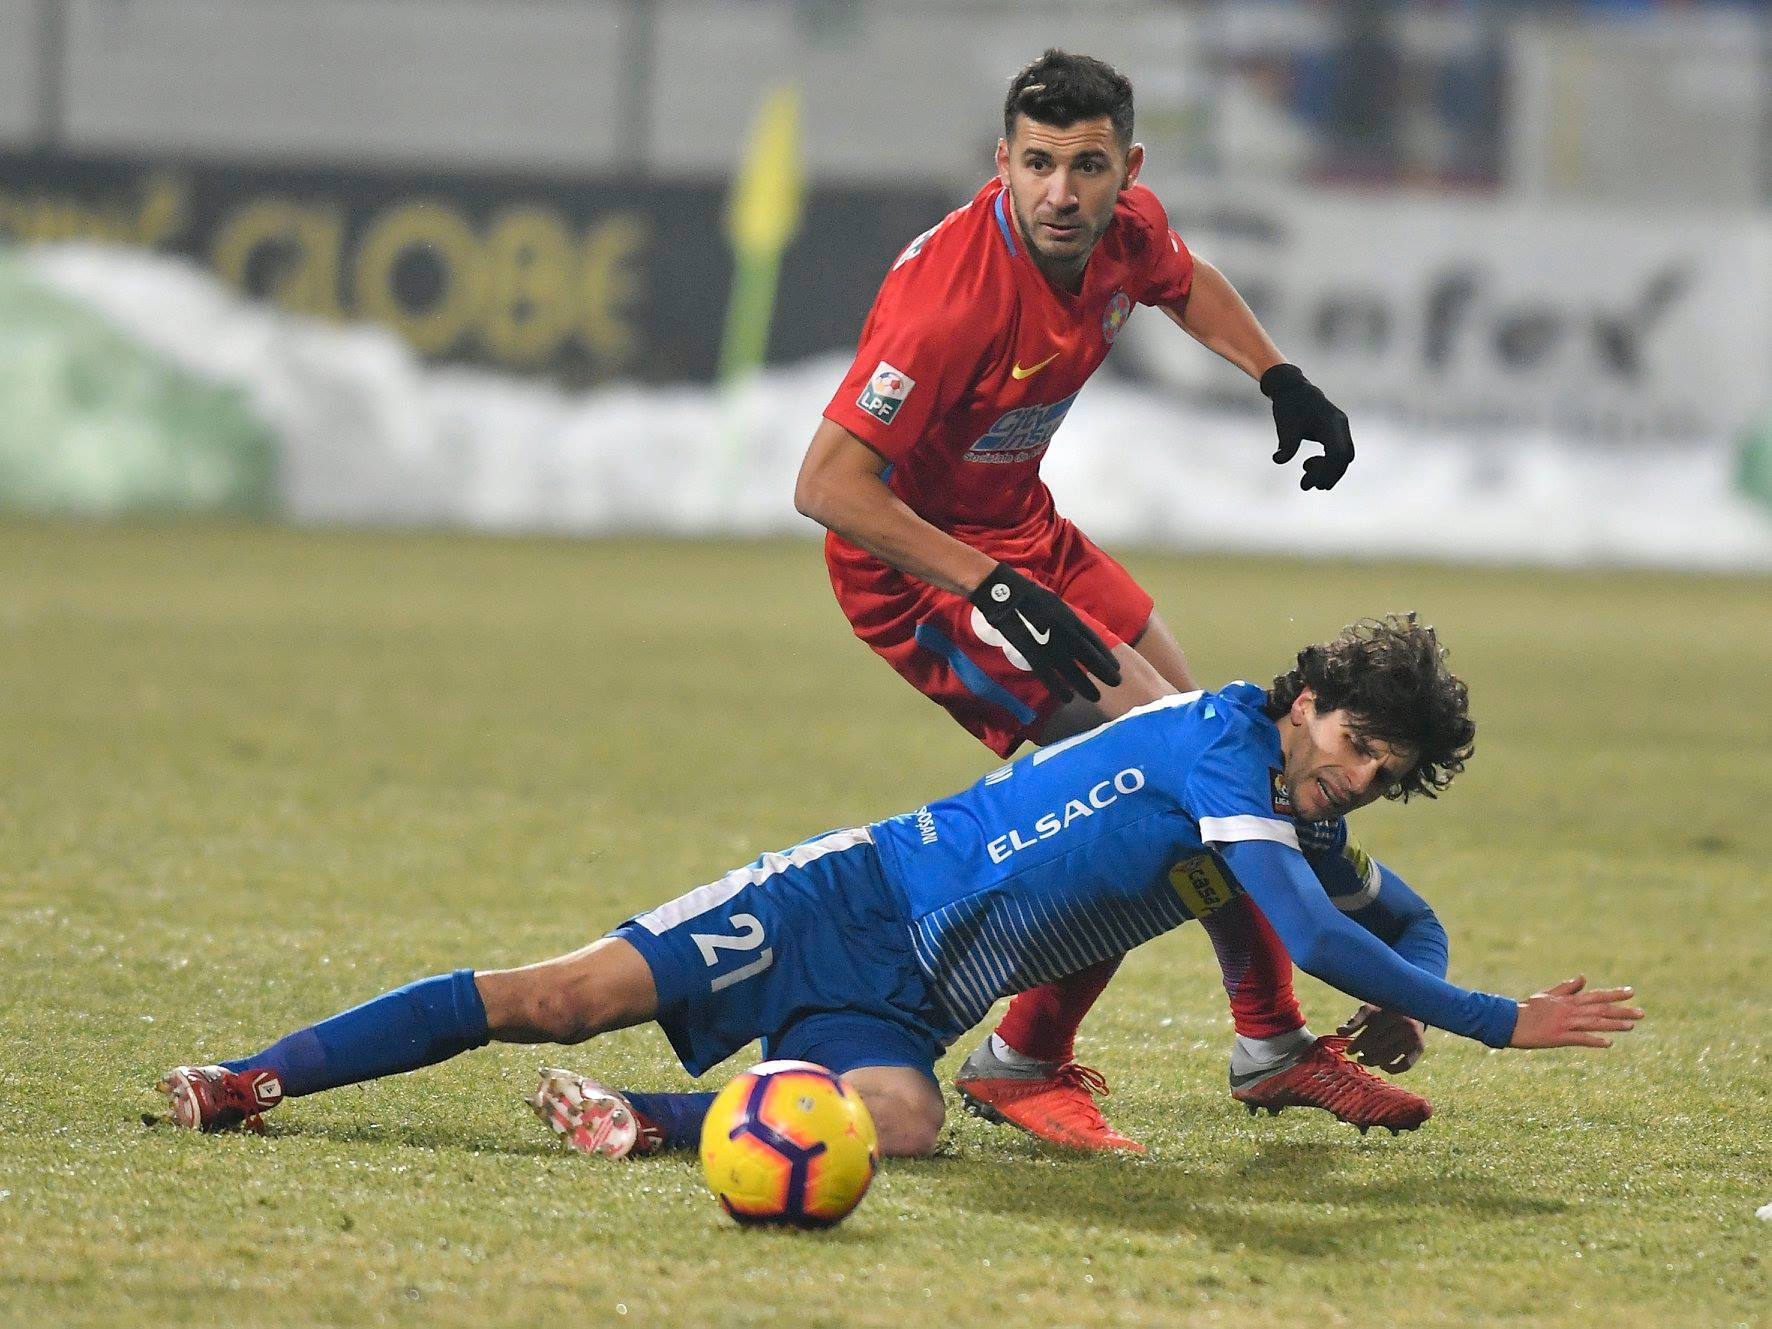 7e7f40381c Botosani e Steaua em campo pelo Campeonato Romeno